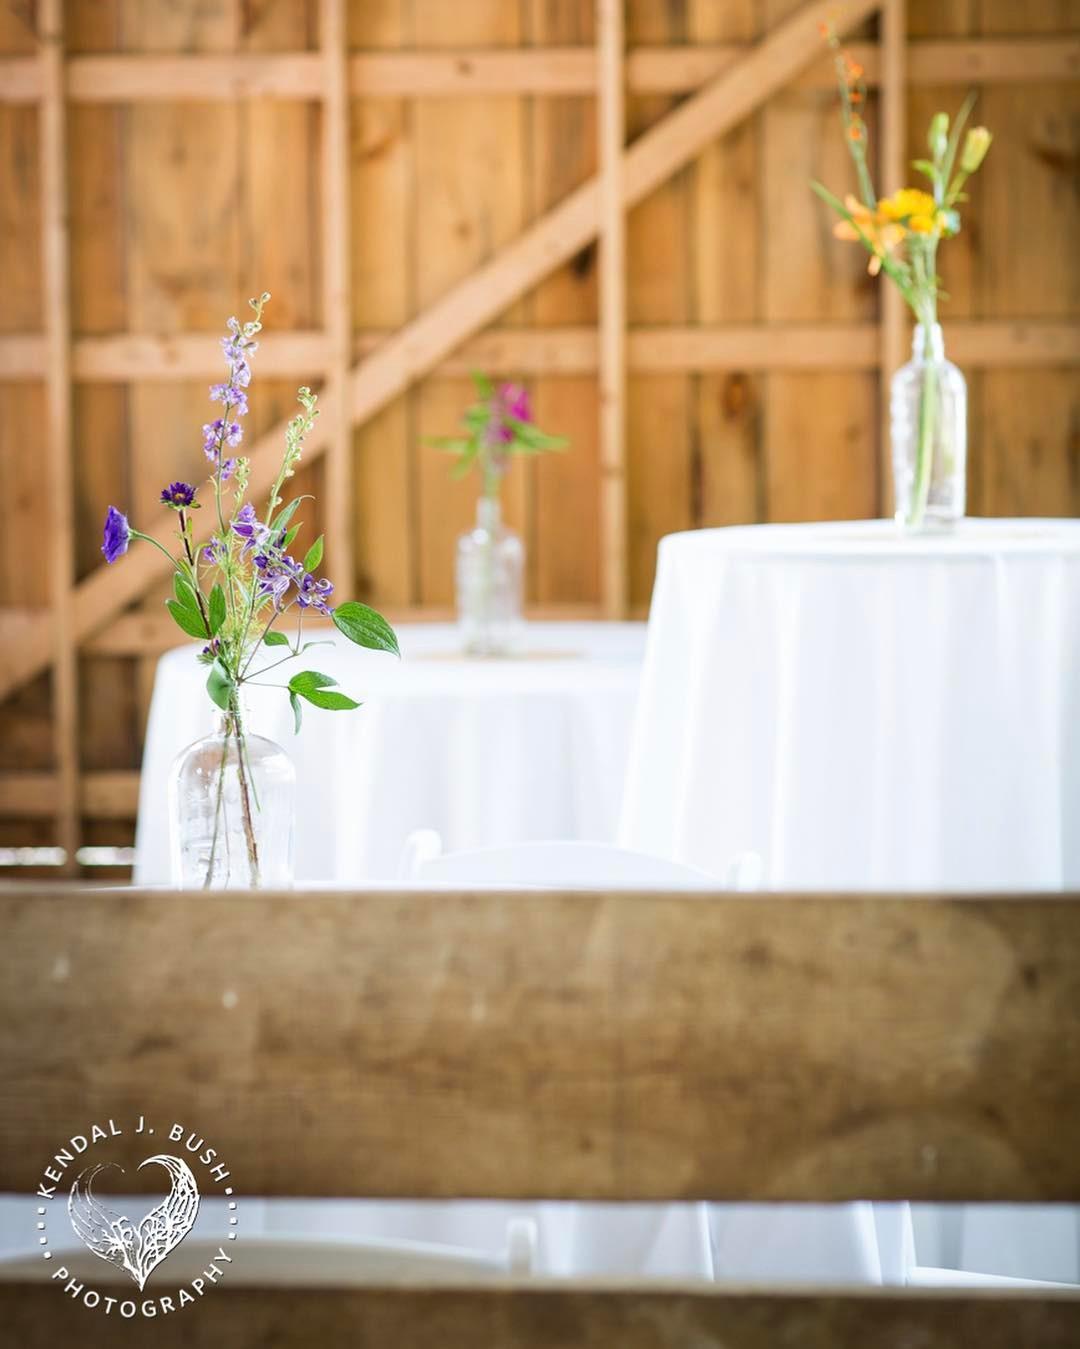 {simple} photo | @kendaljbushphoto  #accents #cocktailhour #simple #budvases #colorwave #sweetness #farmwedding #organicfarm #lotusfloraldesigns #weddingflorist